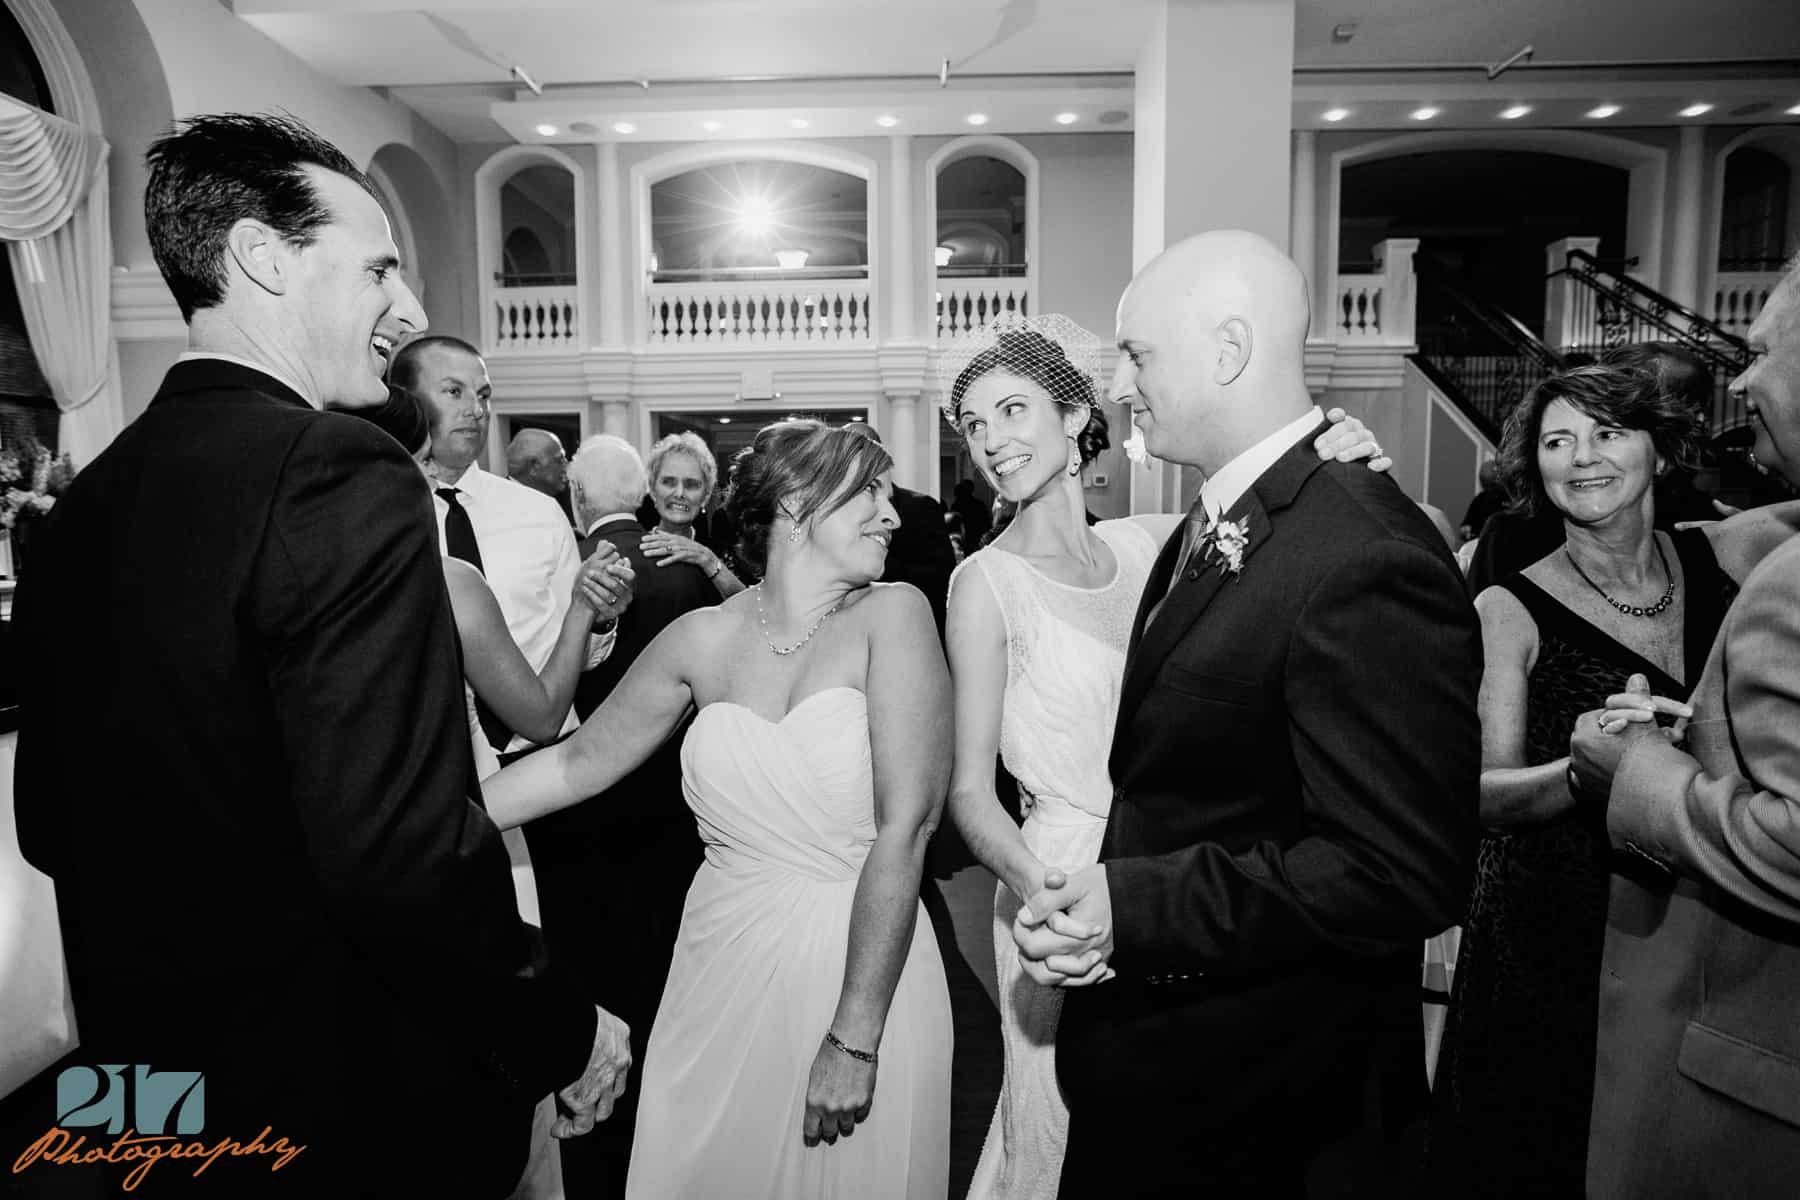 Arts Ballroom weddings